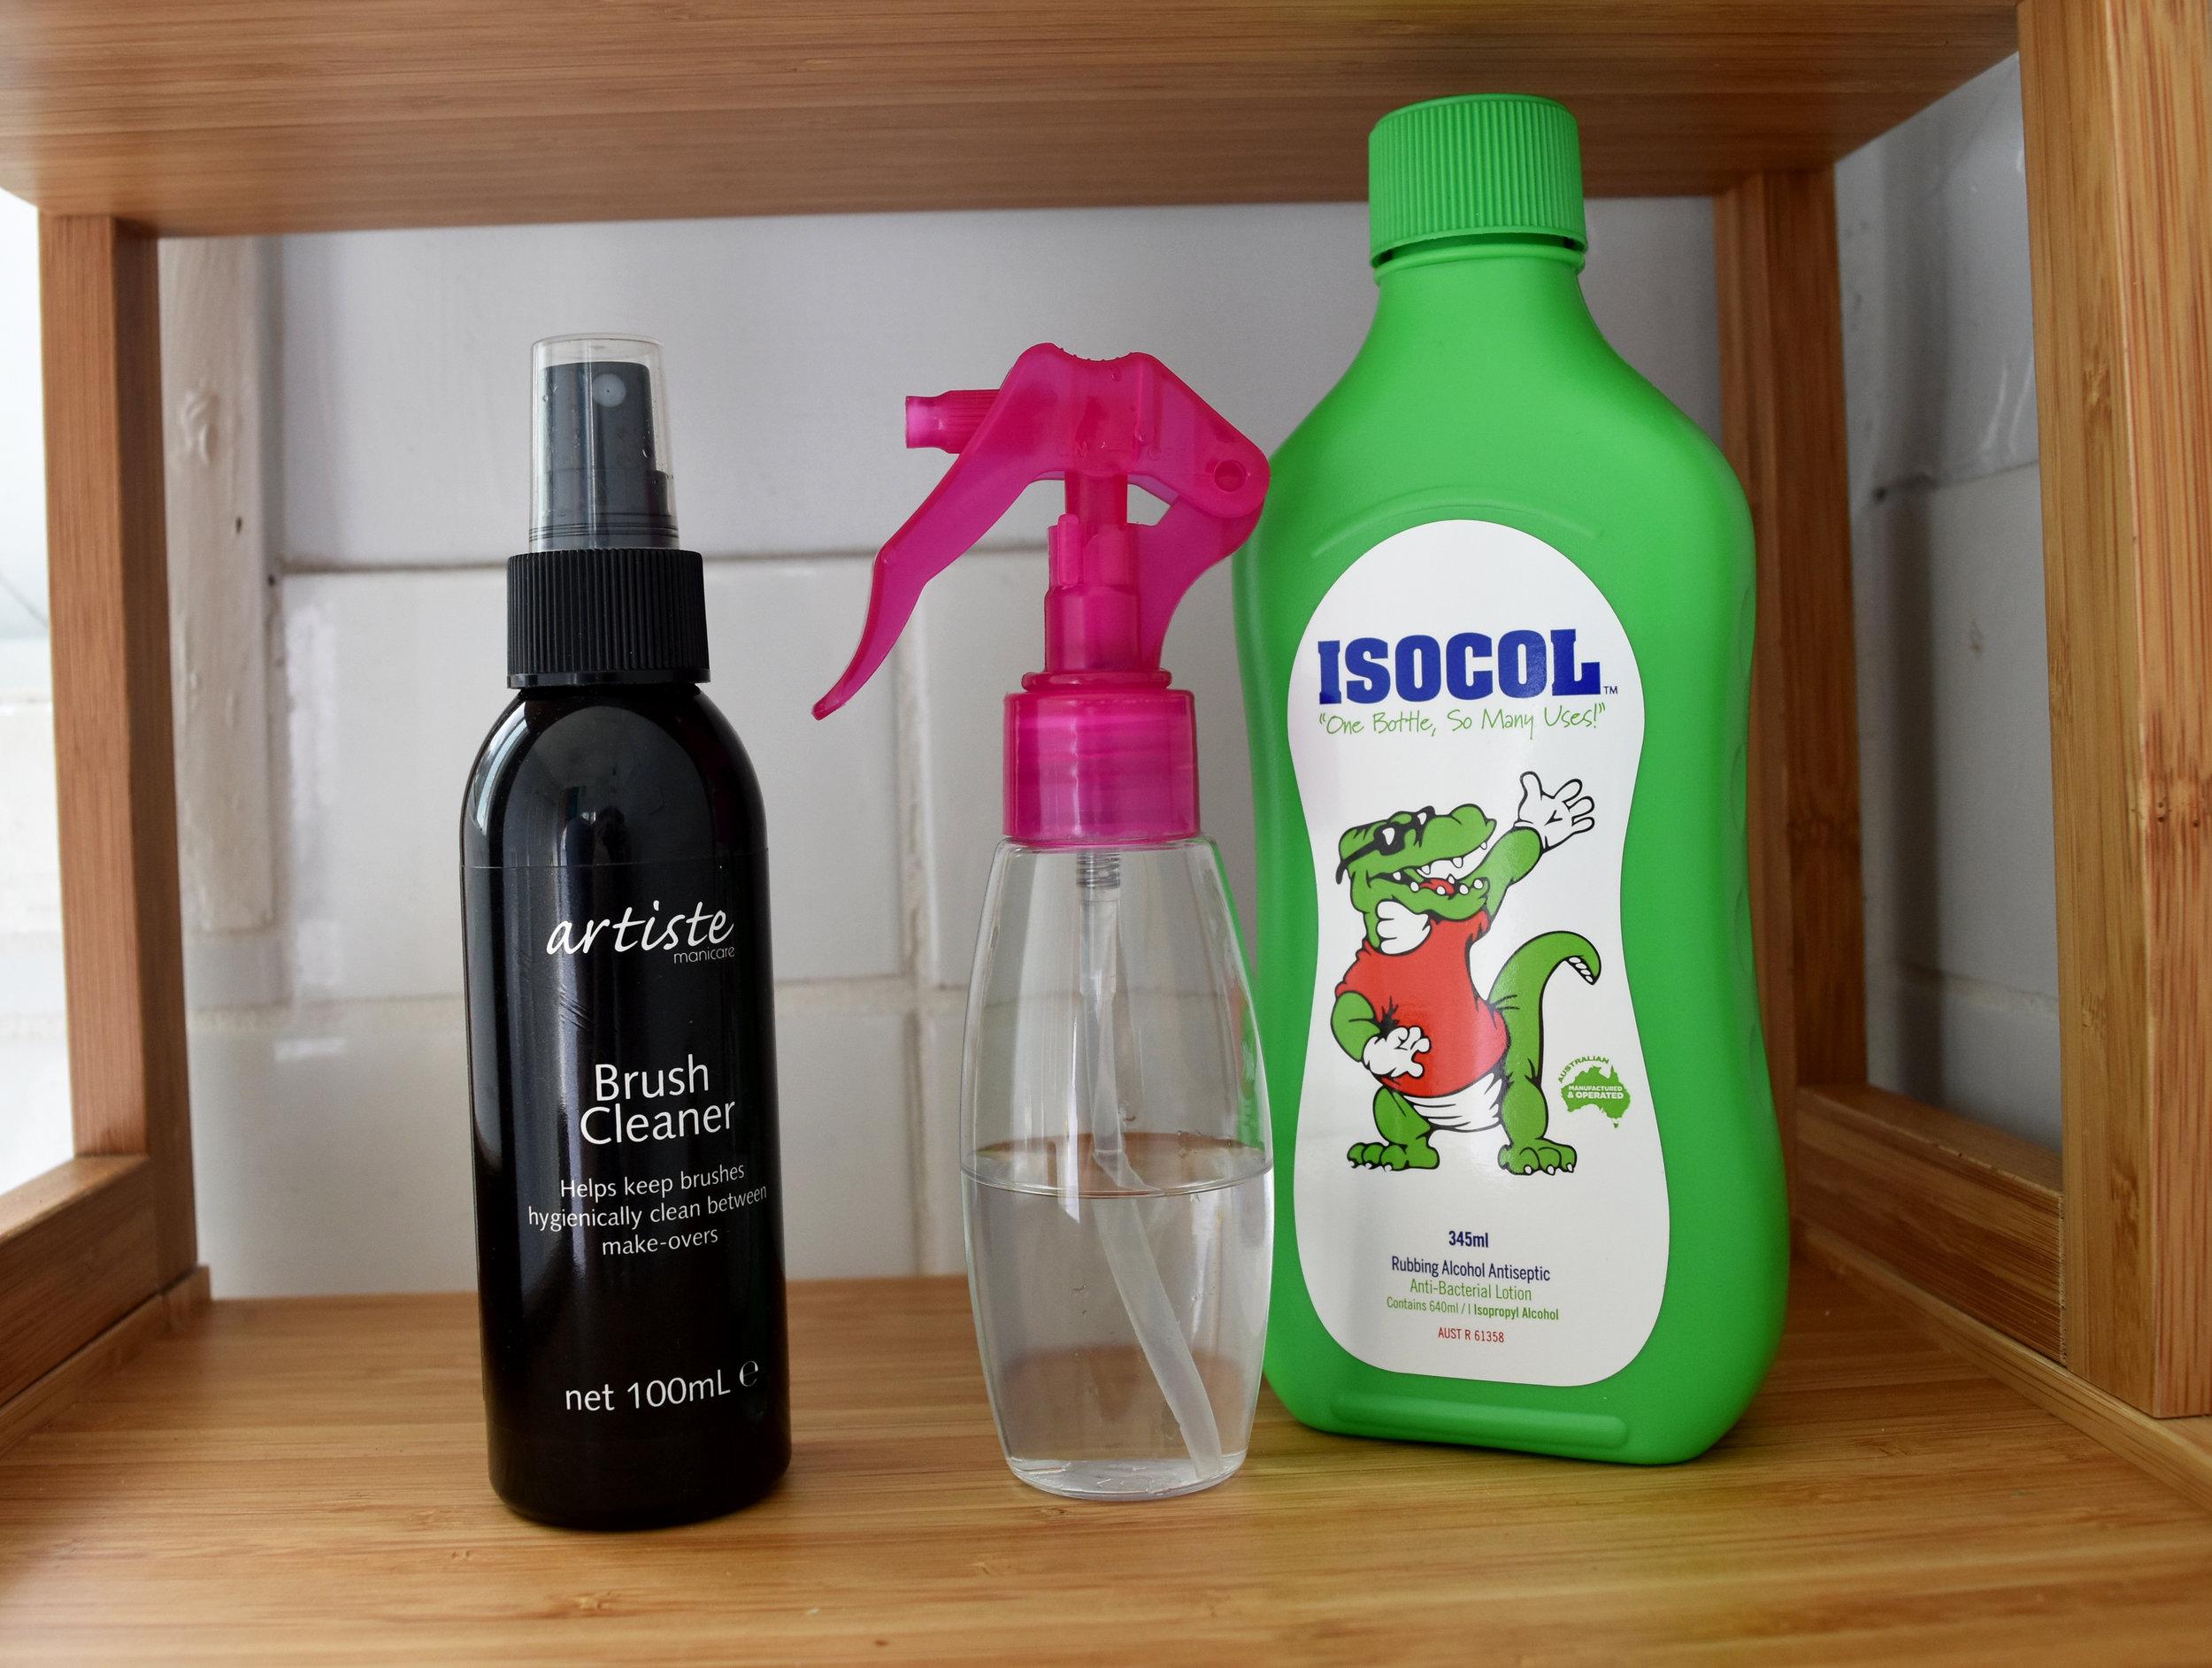 Artiste by Manicare Brush Cleaner ($15.99 per 100 ml) vs Isocol Antiseptic Rubbing Alcohol ($2.90 per 100 ml)